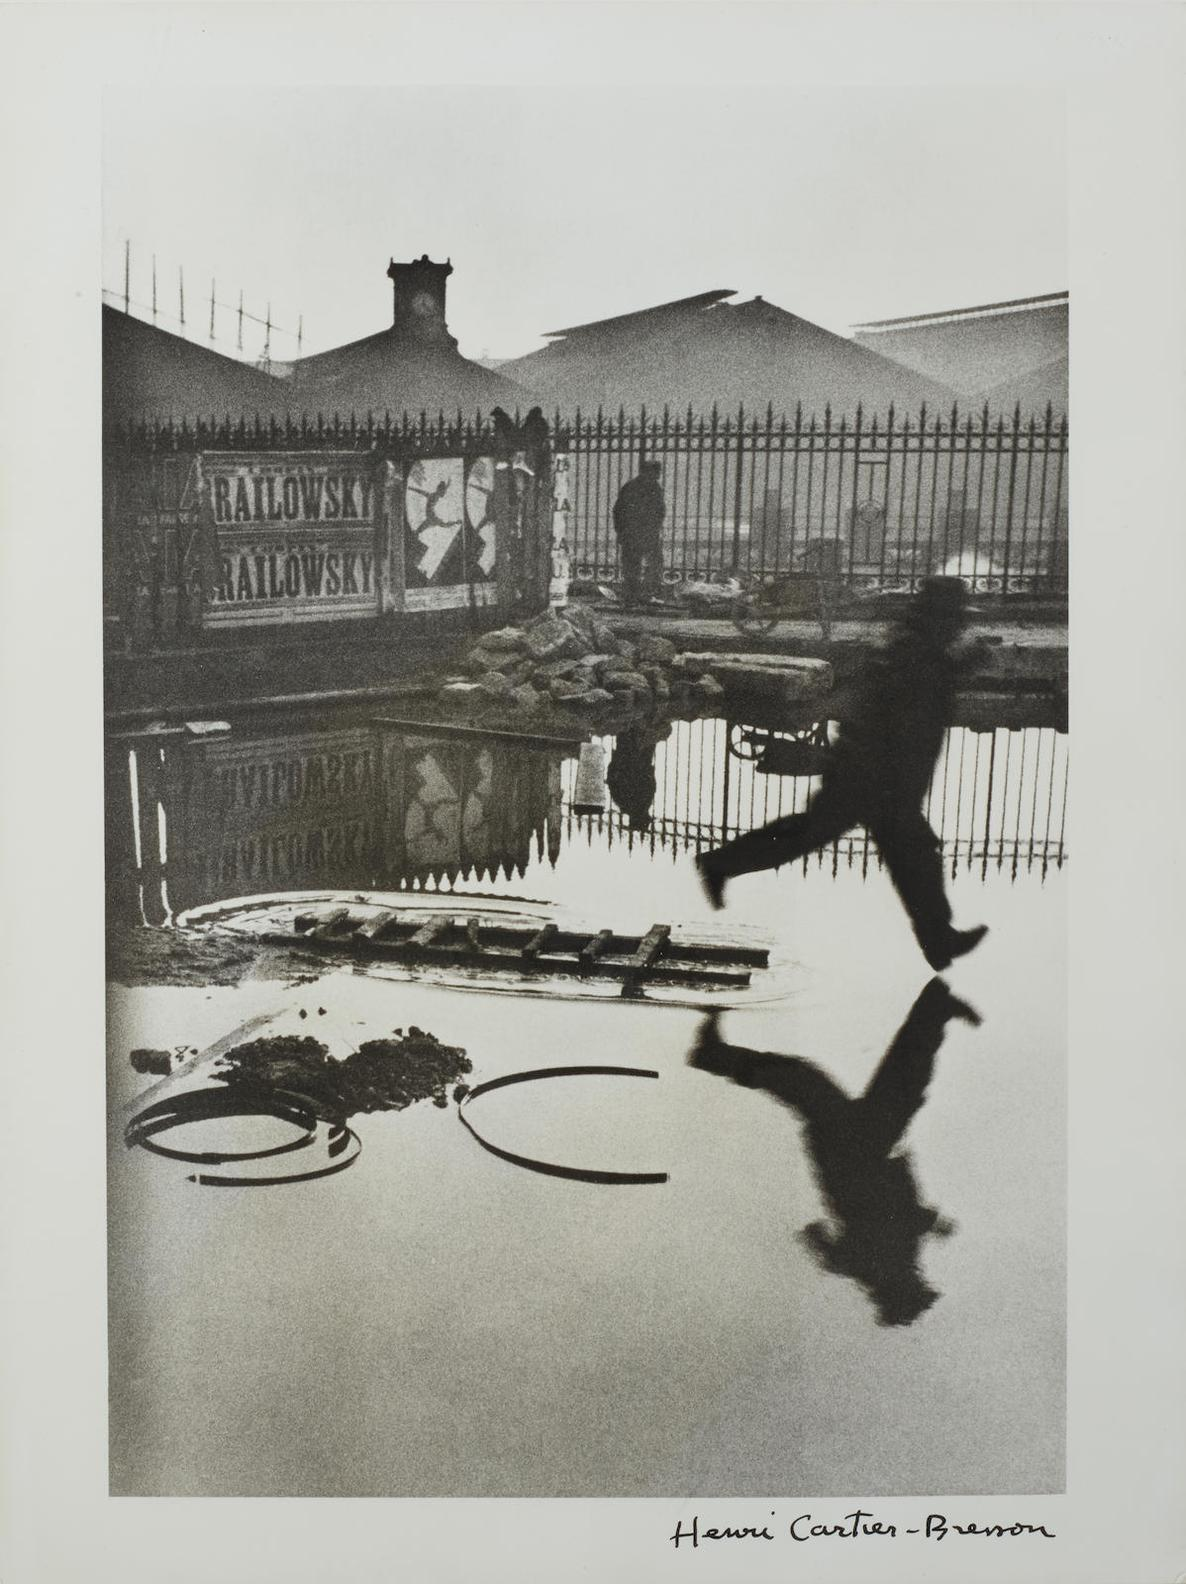 Henri Cartier-Bresson-Behind The Gare St.-Lazare-1932